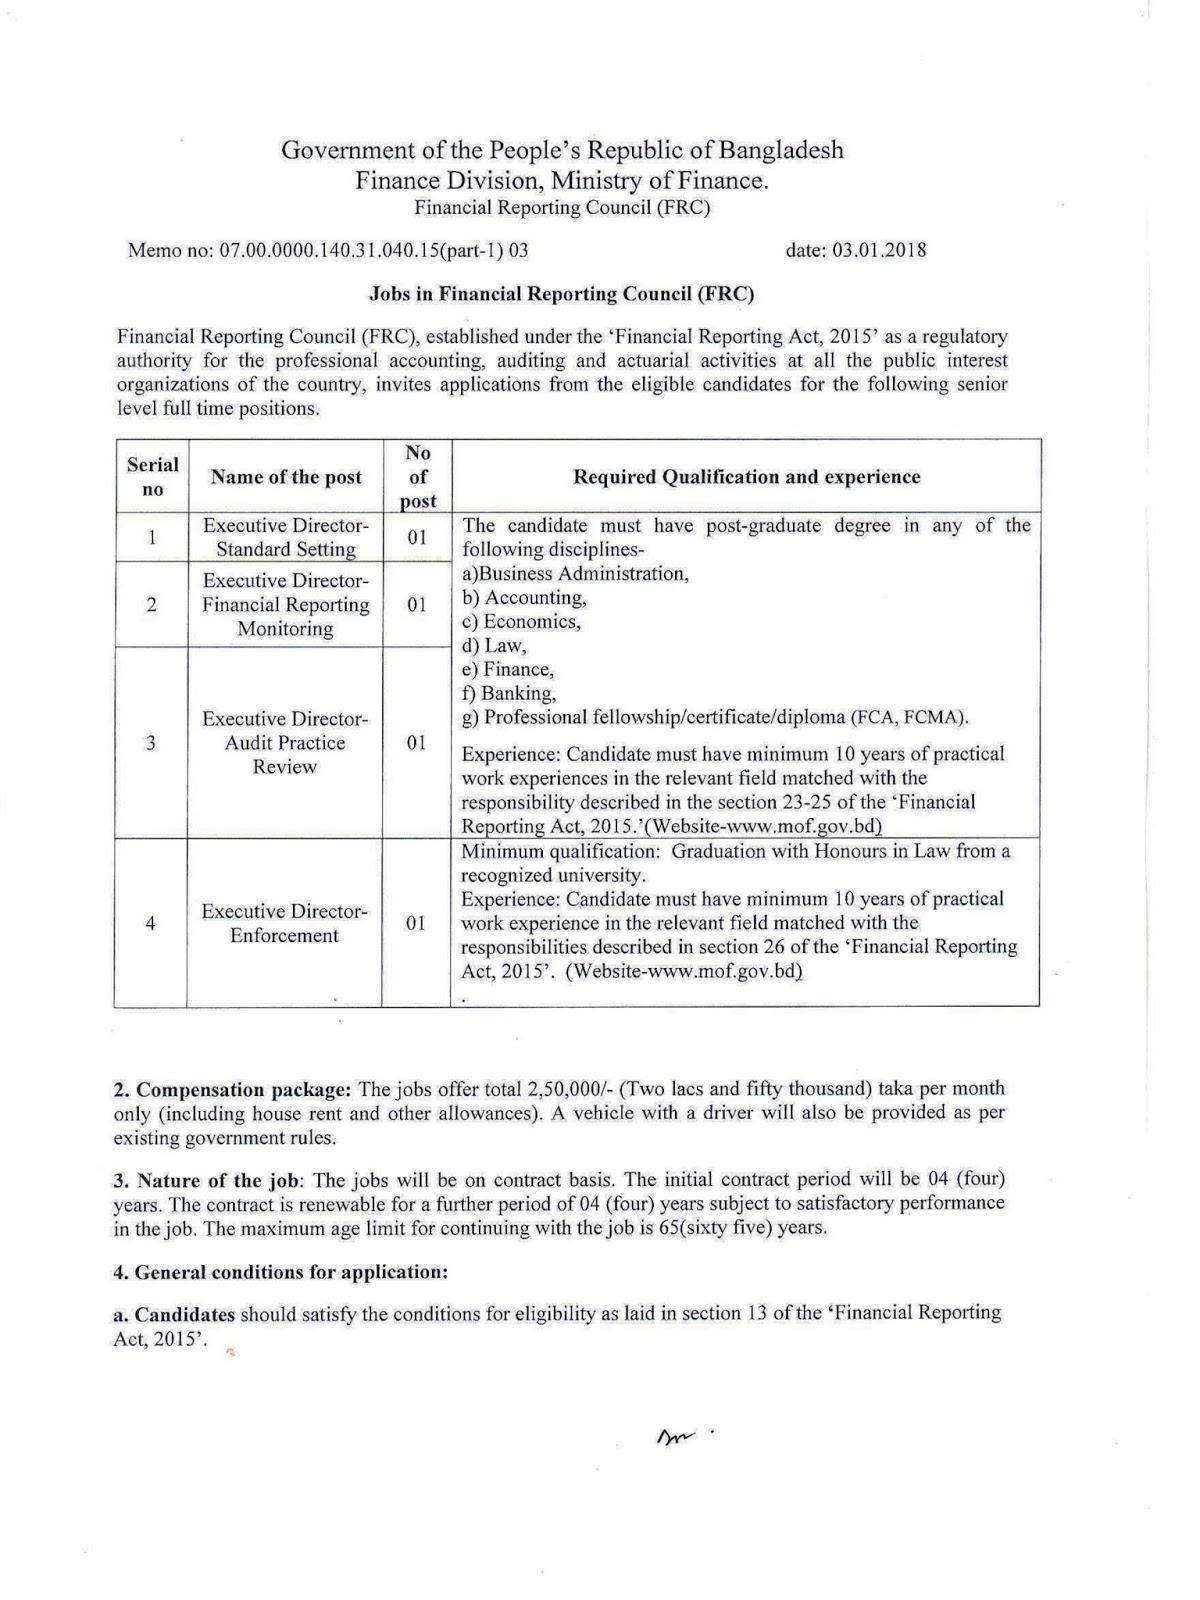 Financial Reporting Council (FRC) job circular 2018